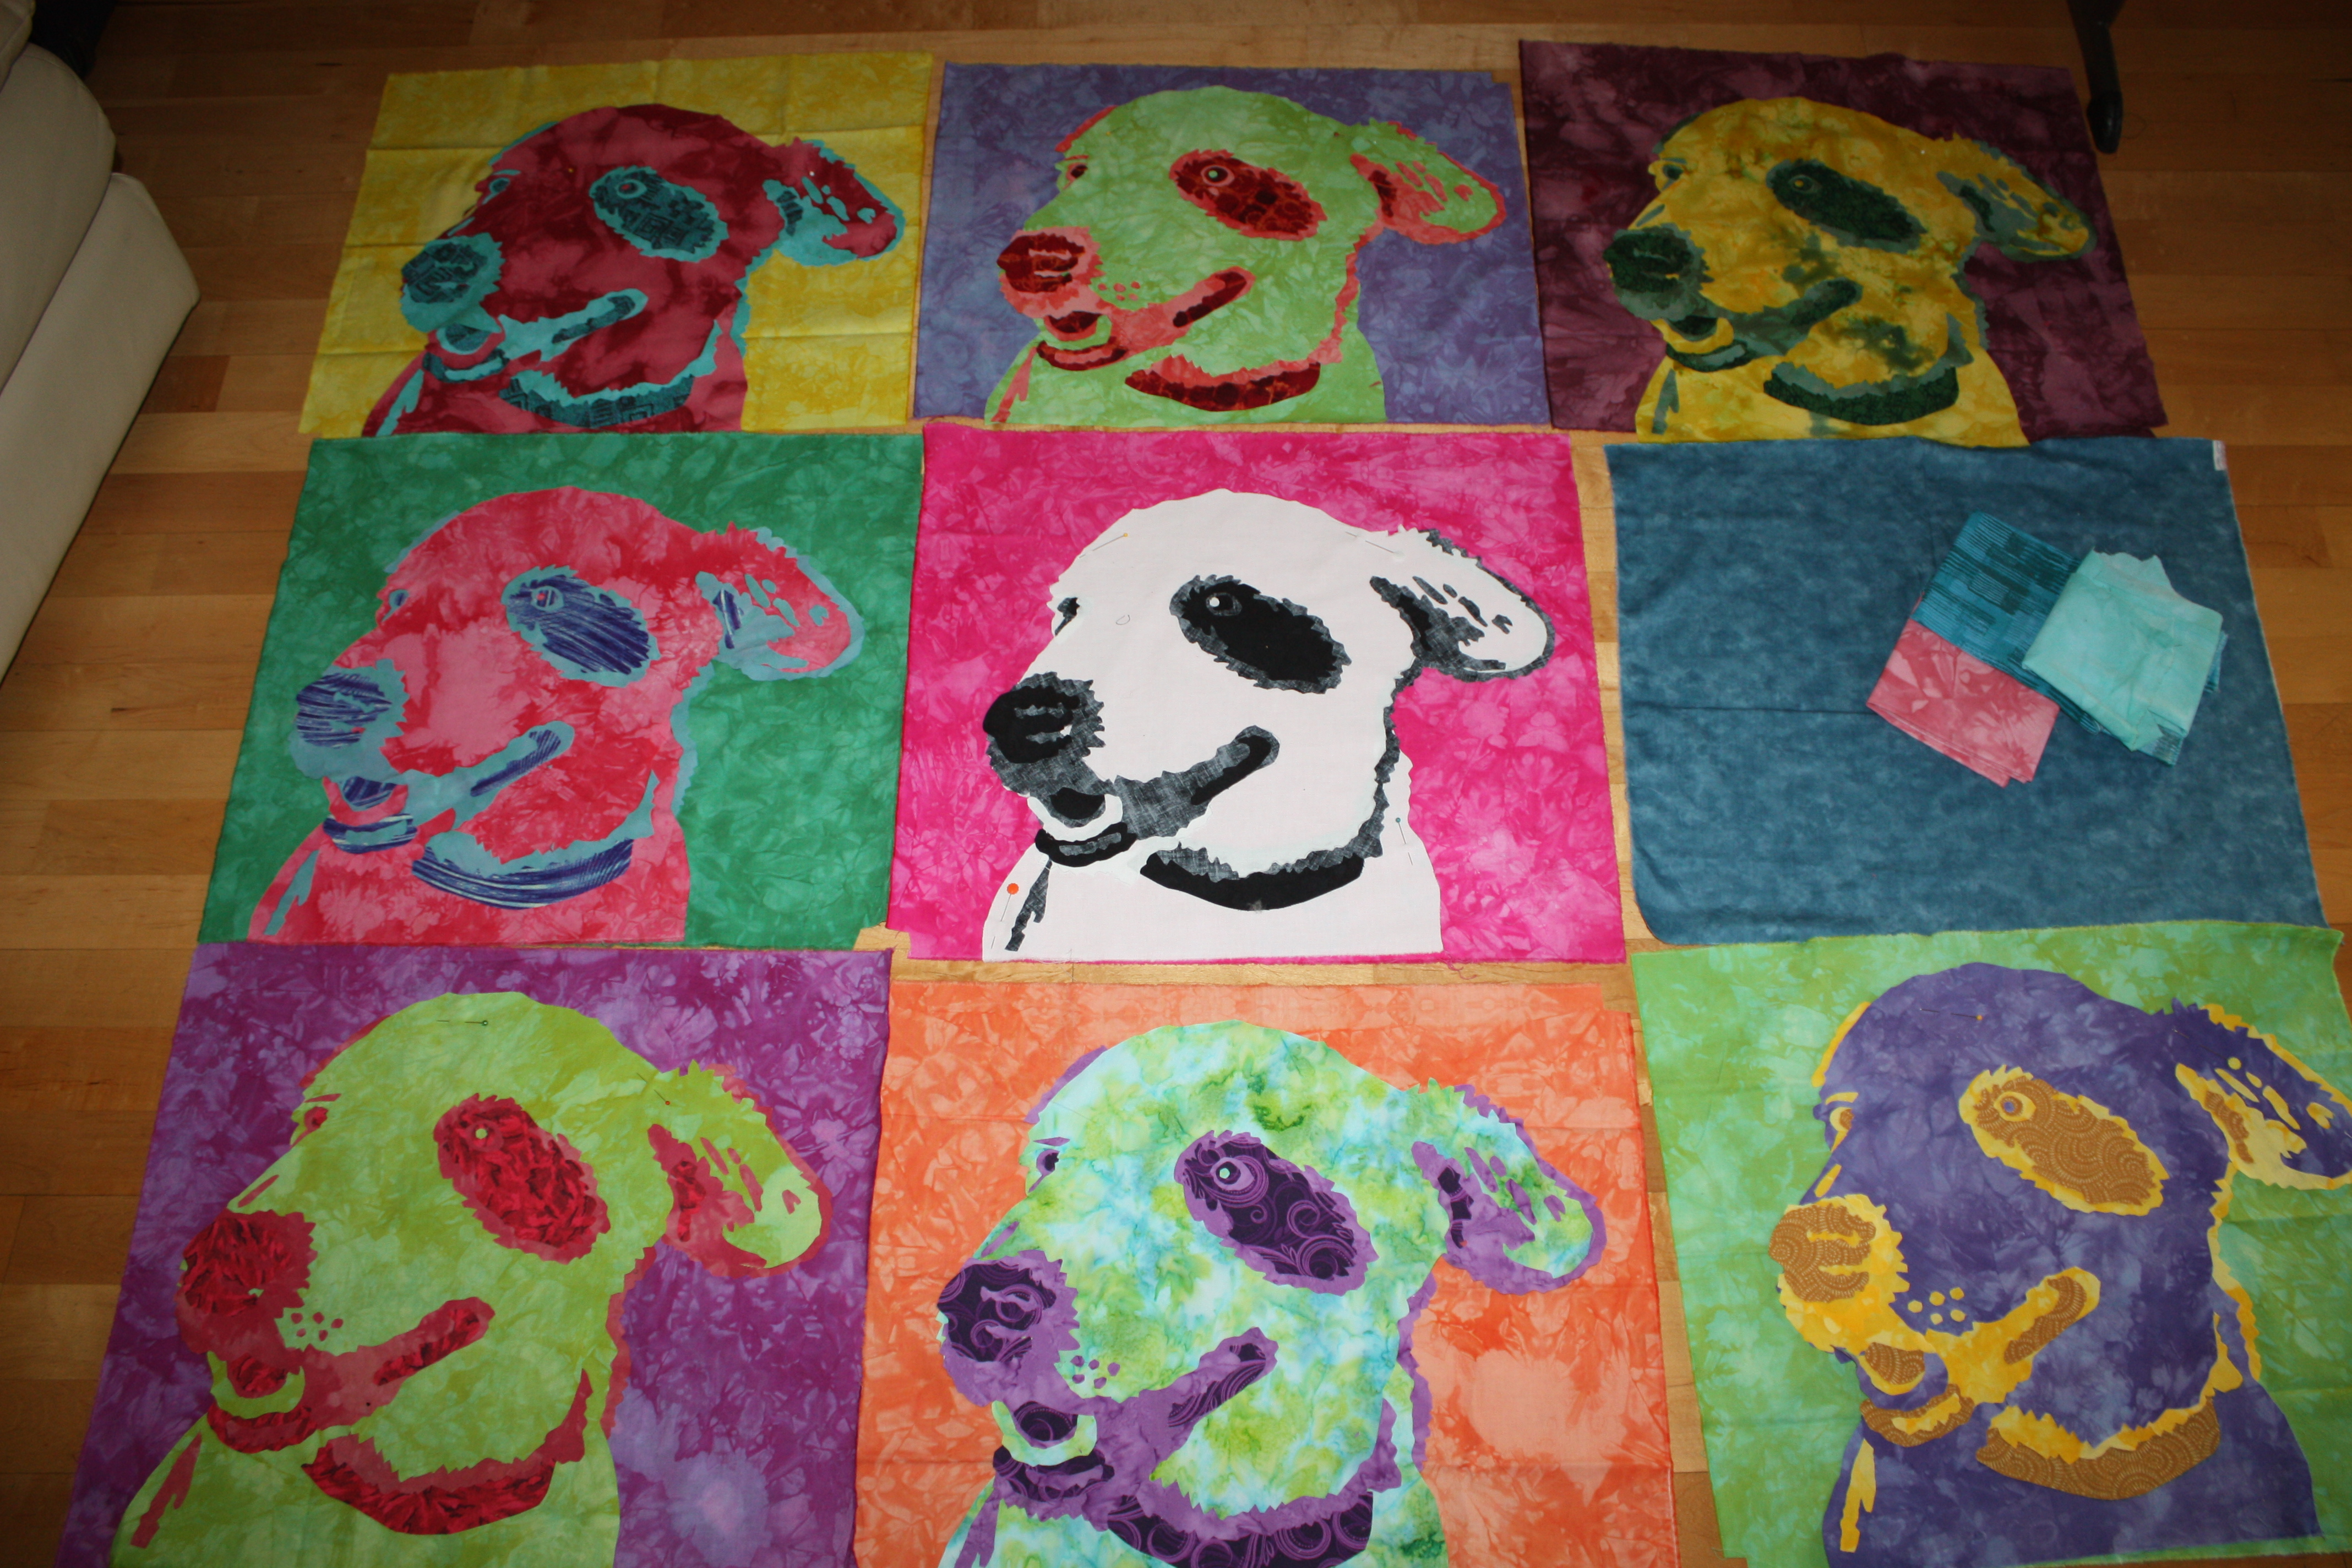 Nine patch Andy Warhol style Jane Haworth